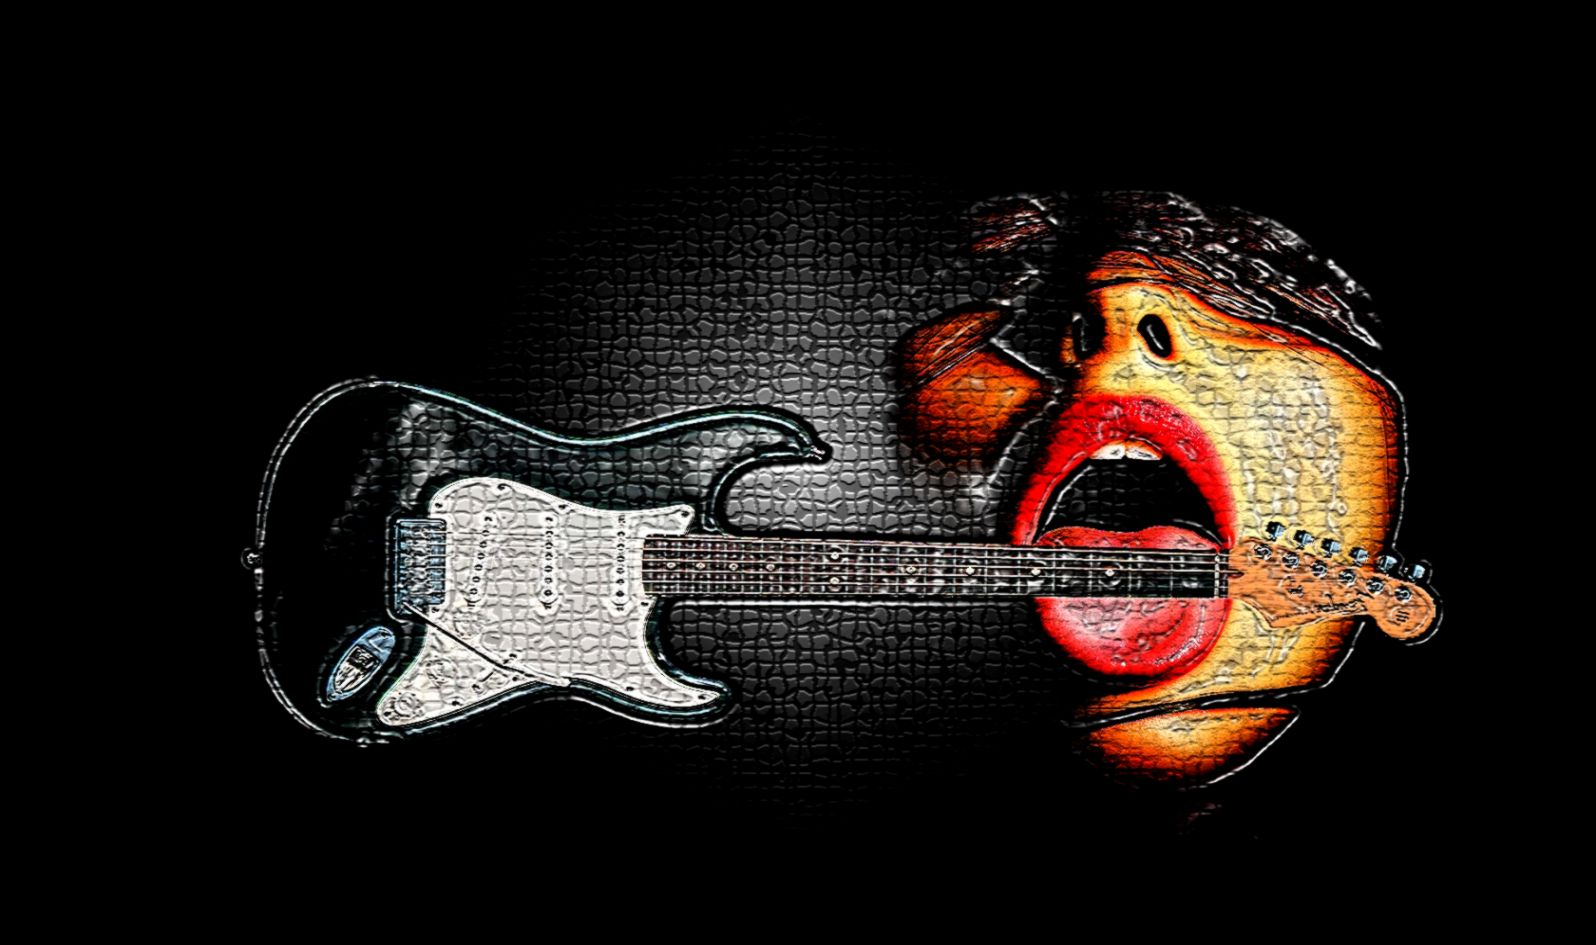 Musical instruments soundcraft si3 wallpaper wallpaper for Exclusive 3d wallpaper